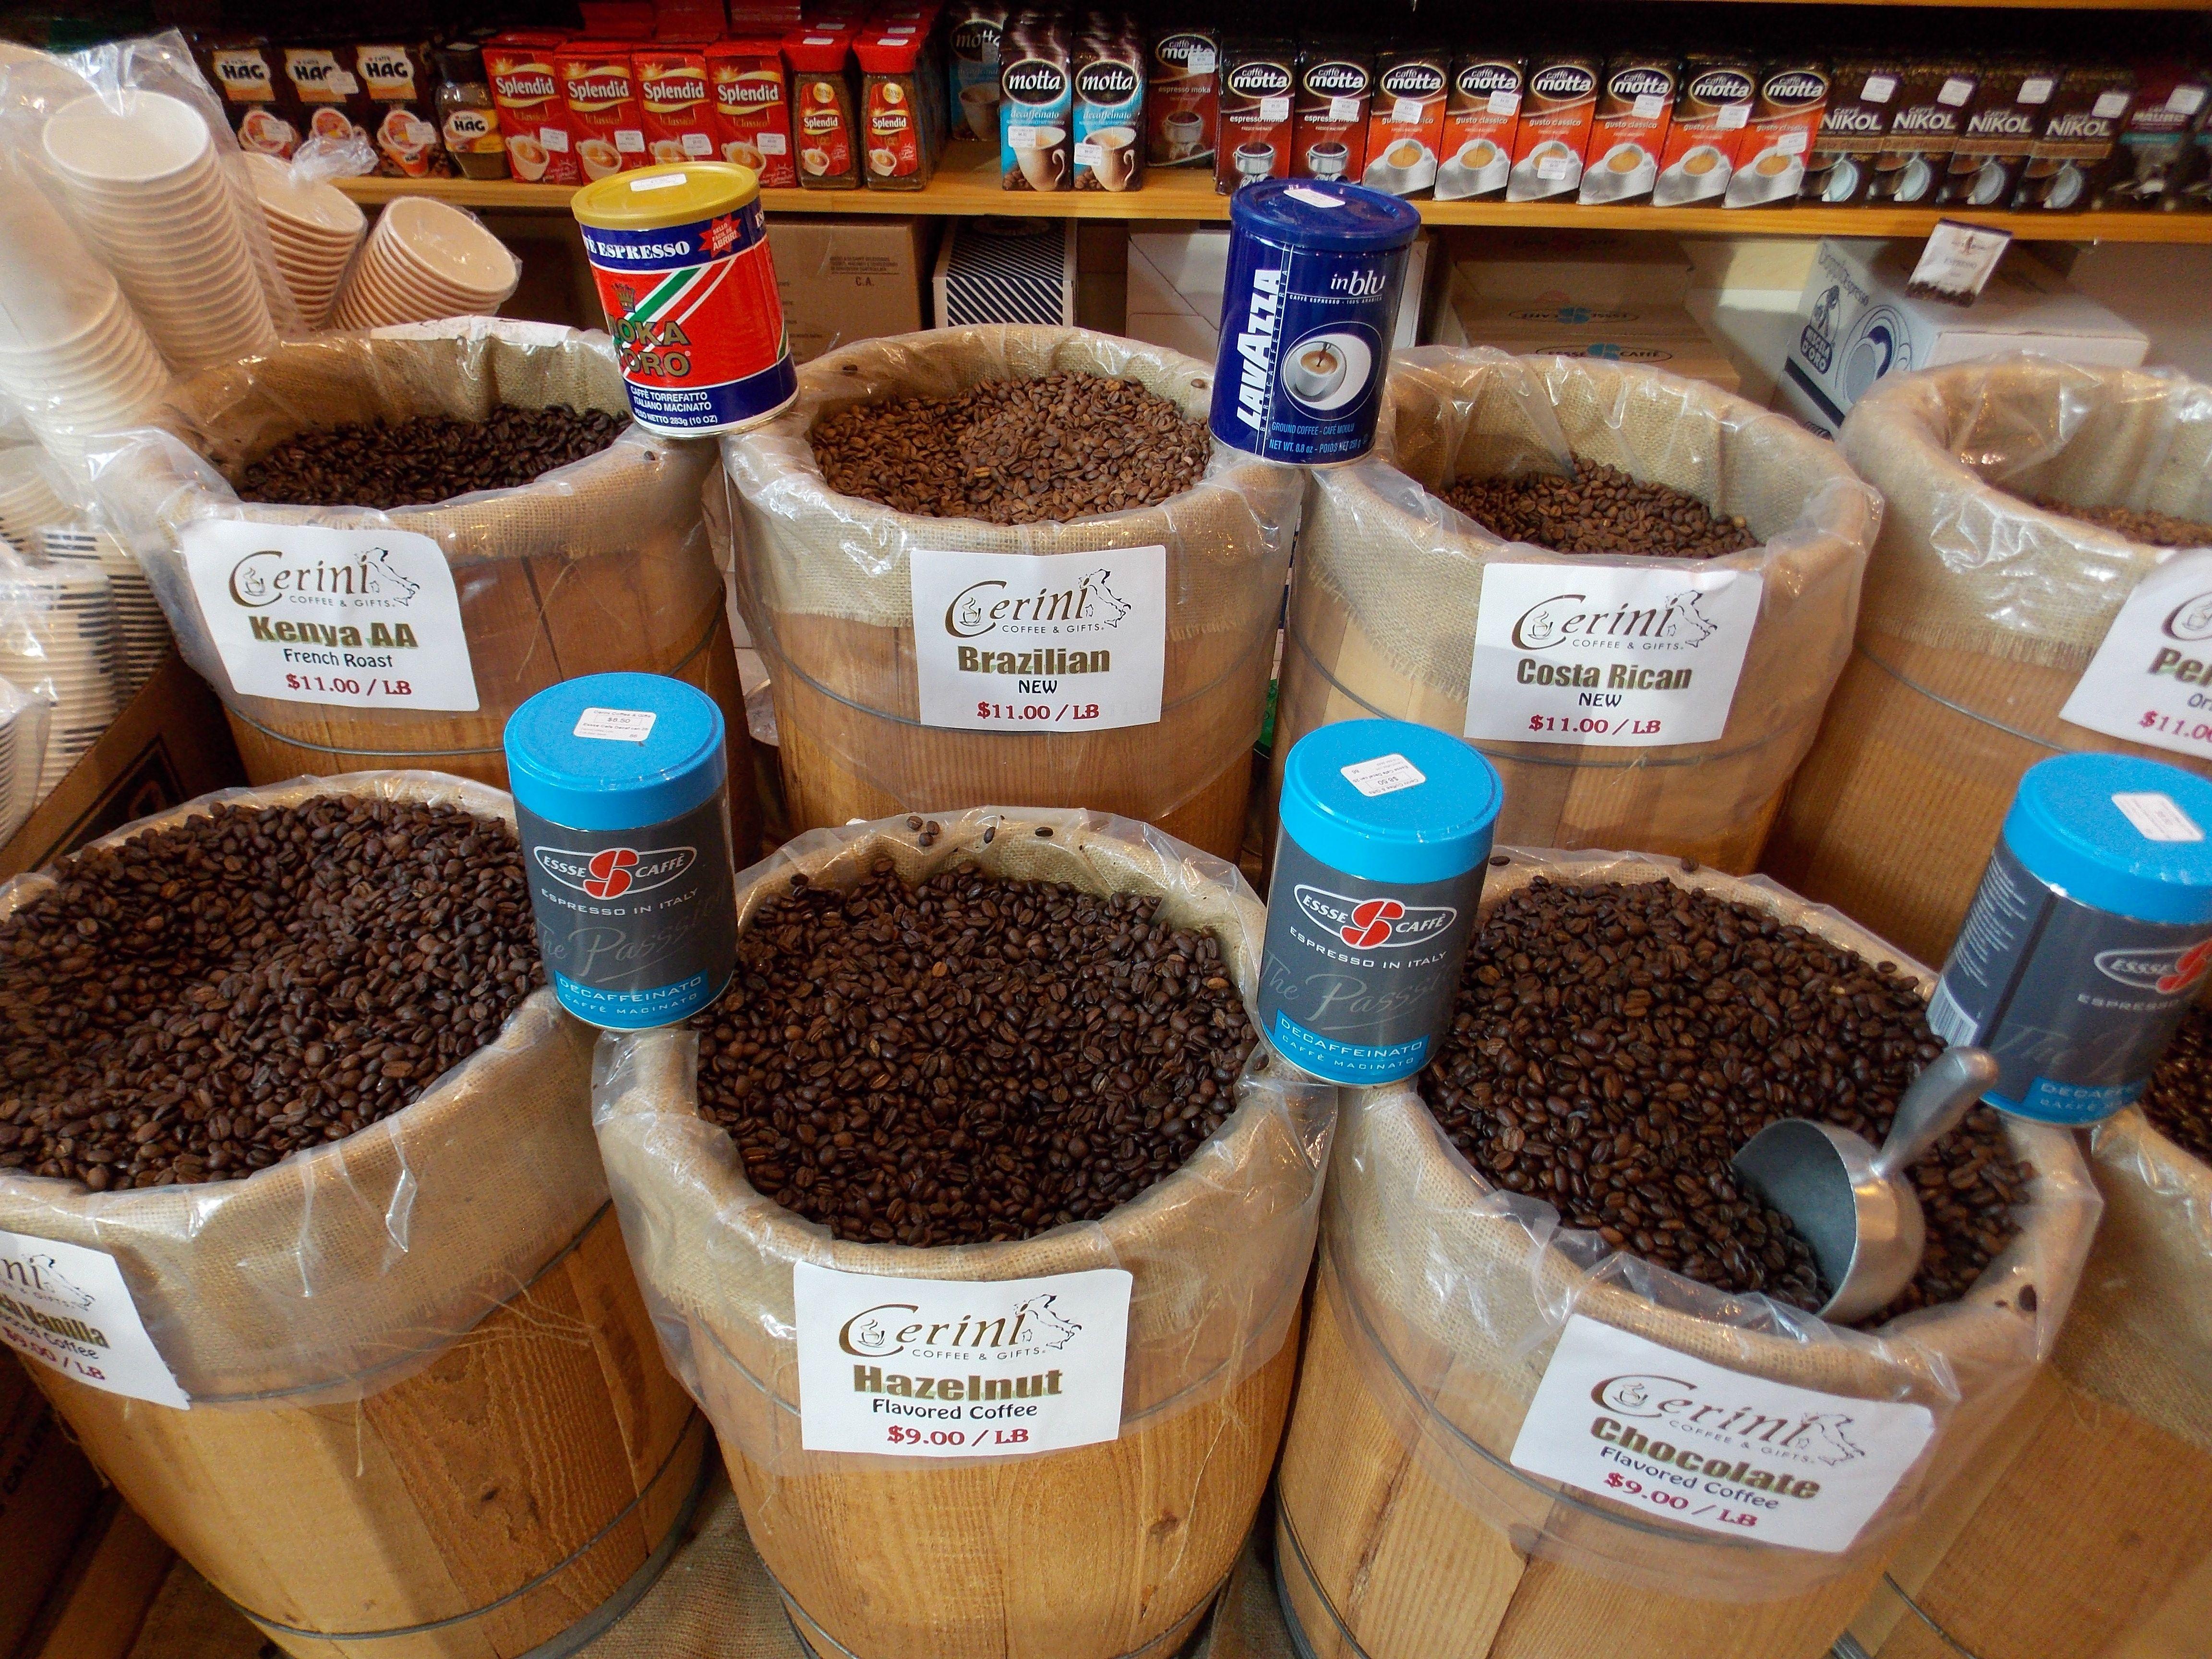 Cerini's Coffee & Gifts